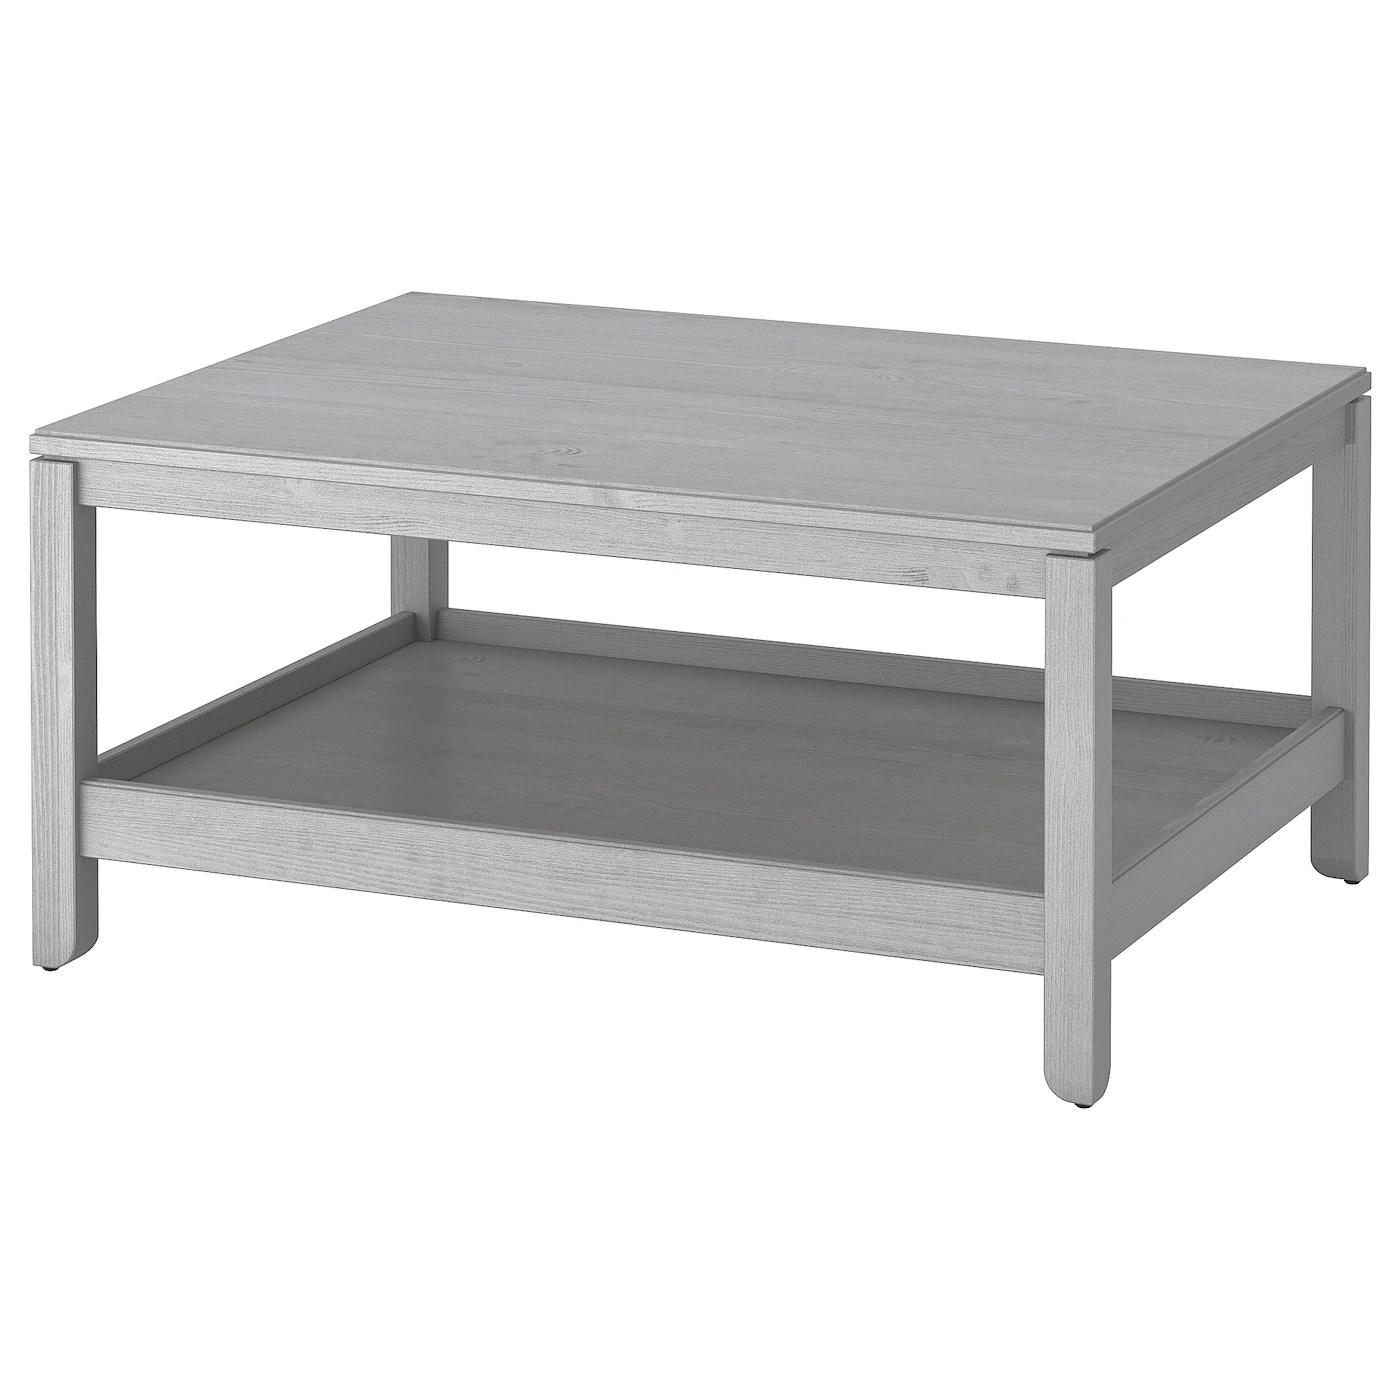 havsta coffee table gray 39 3 8x29 1 2